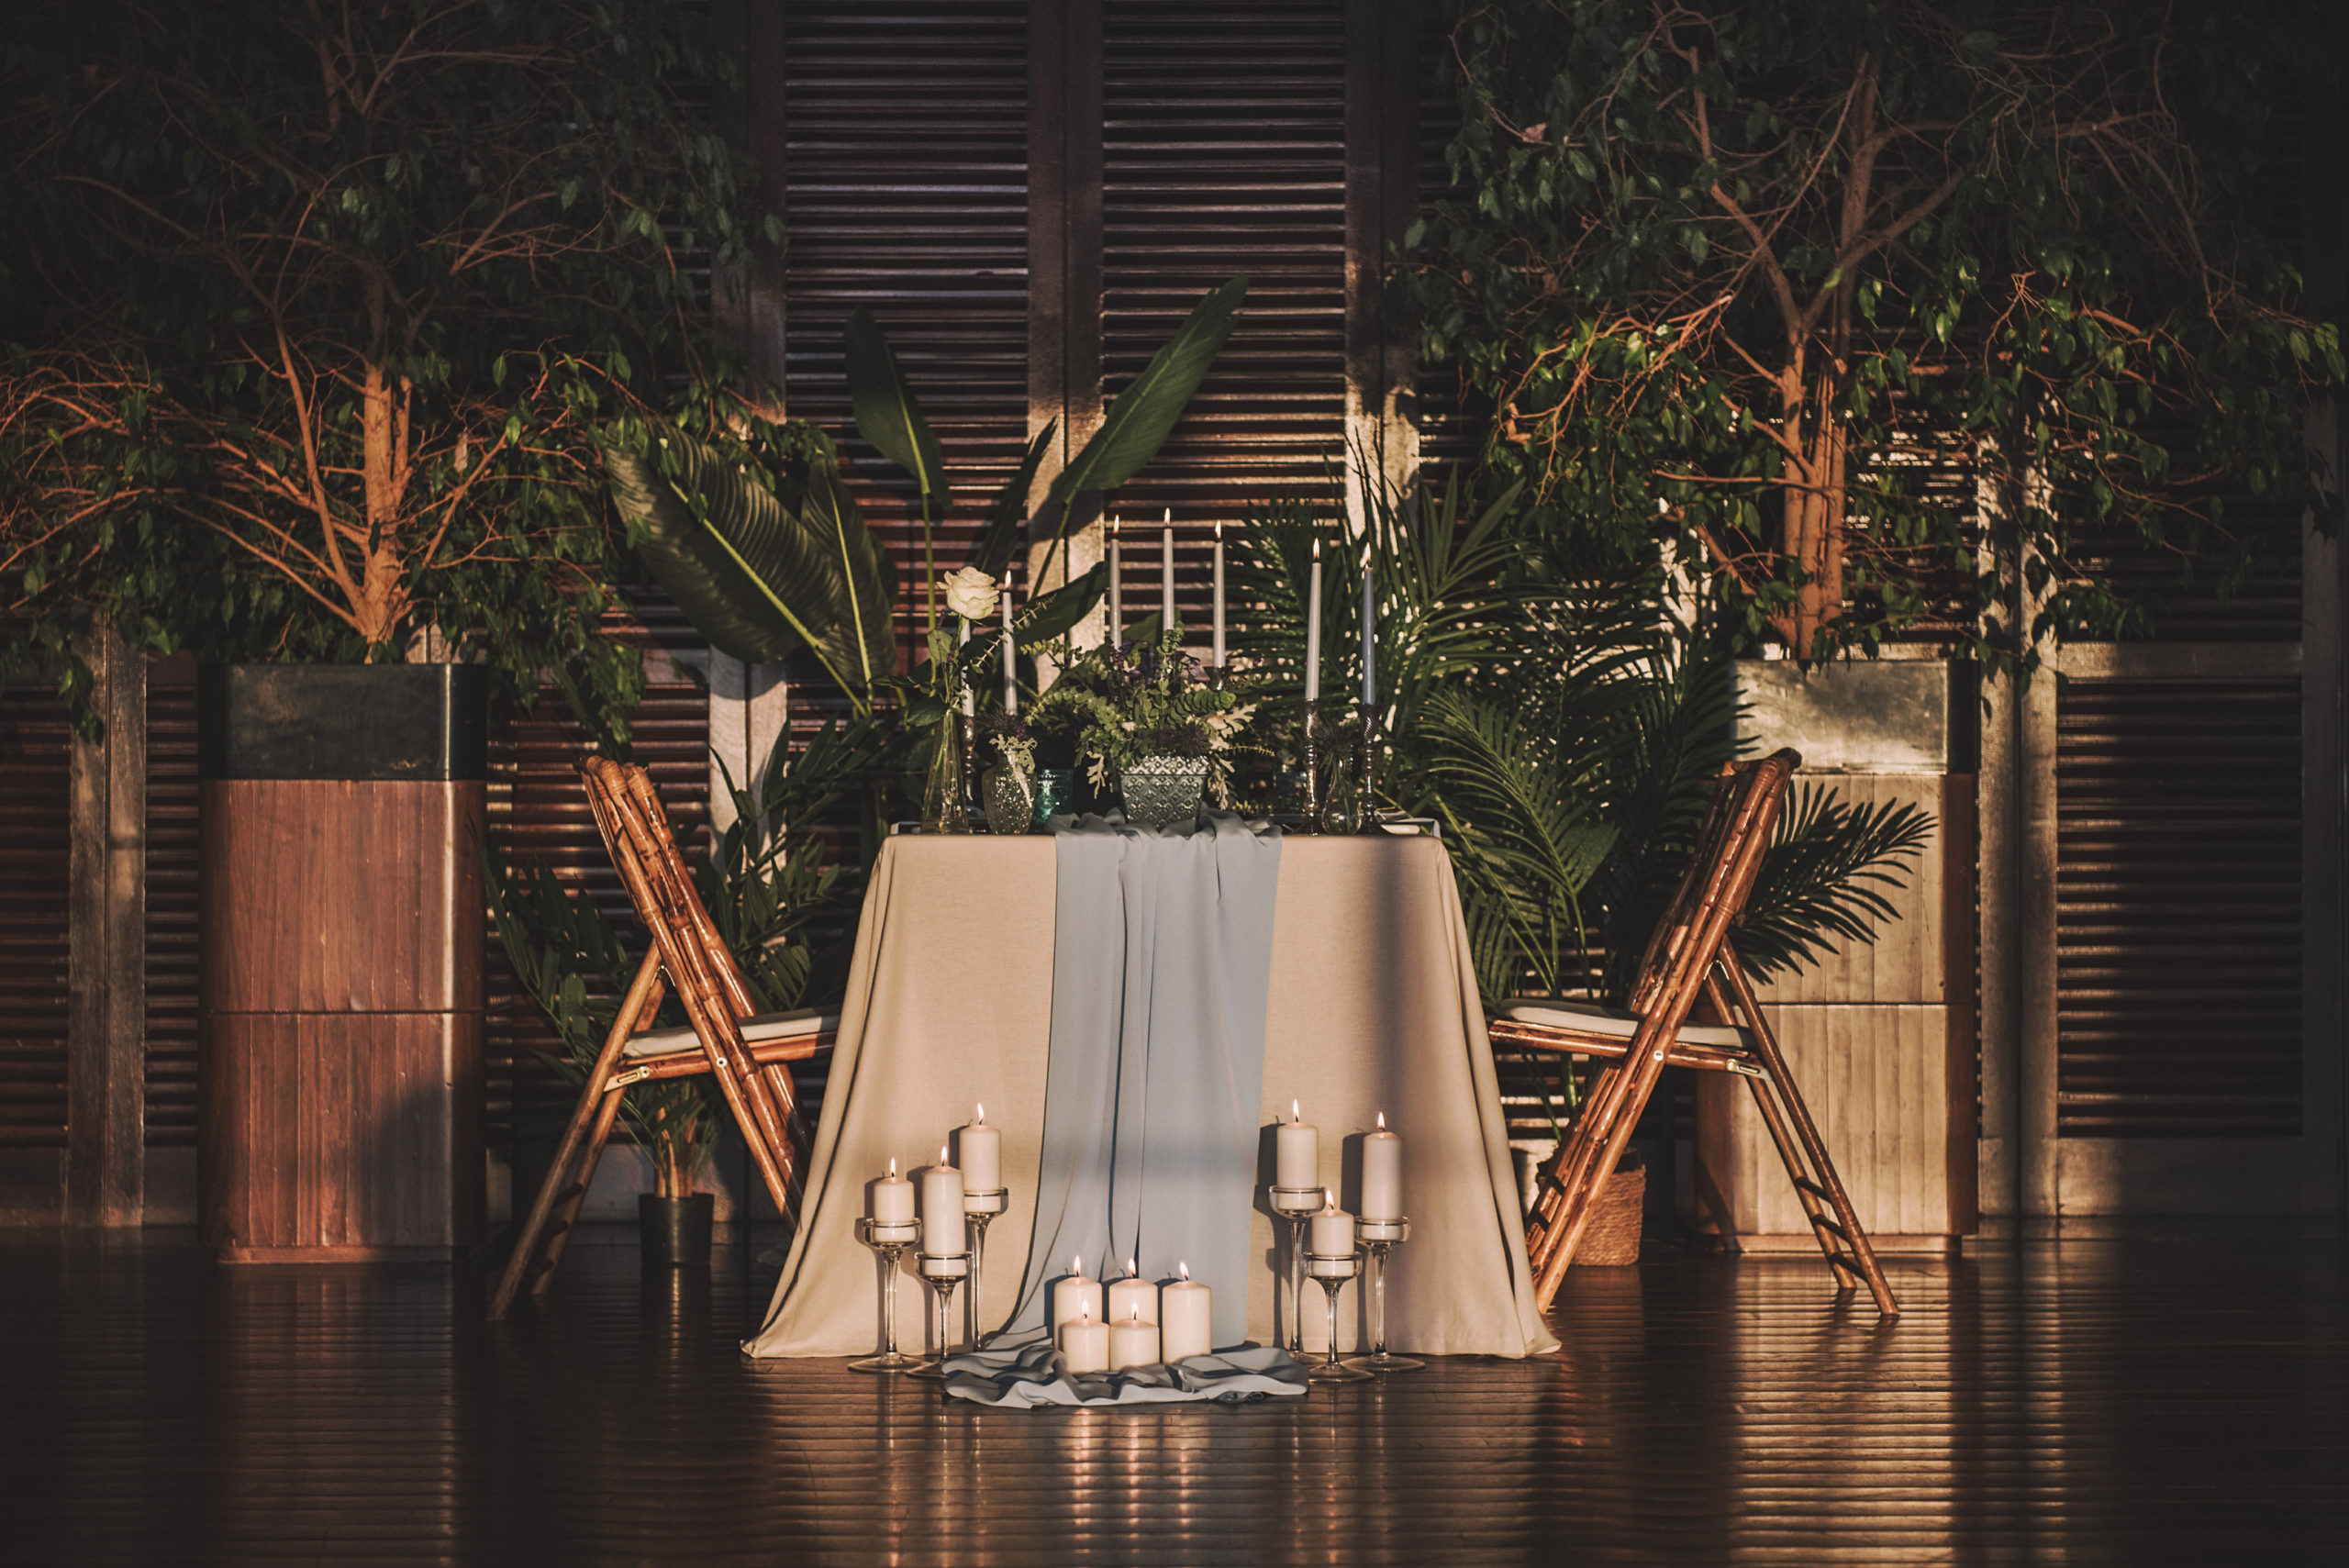 Mesa íntima romántica para dos personas